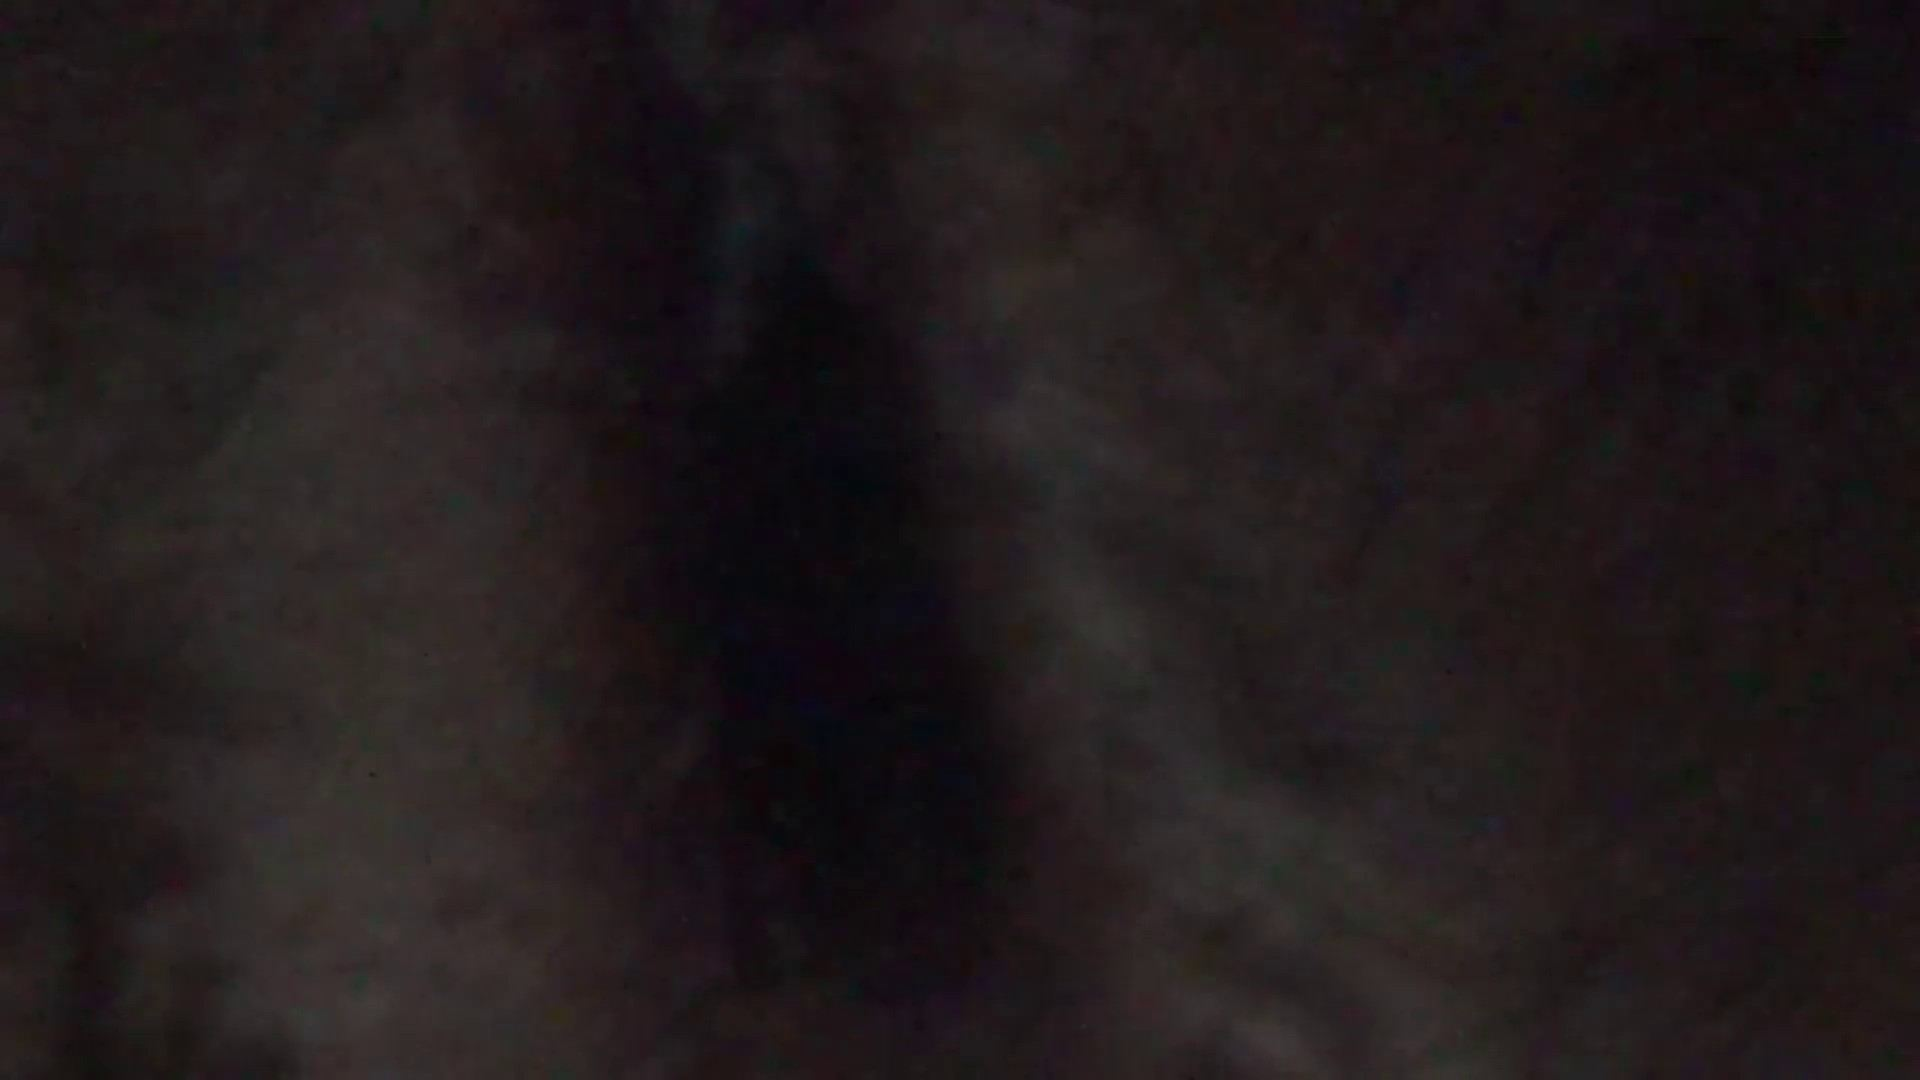 JD盗撮 美女の洗面所の秘密 Vol.44 美女 性交動画流出 91枚 34